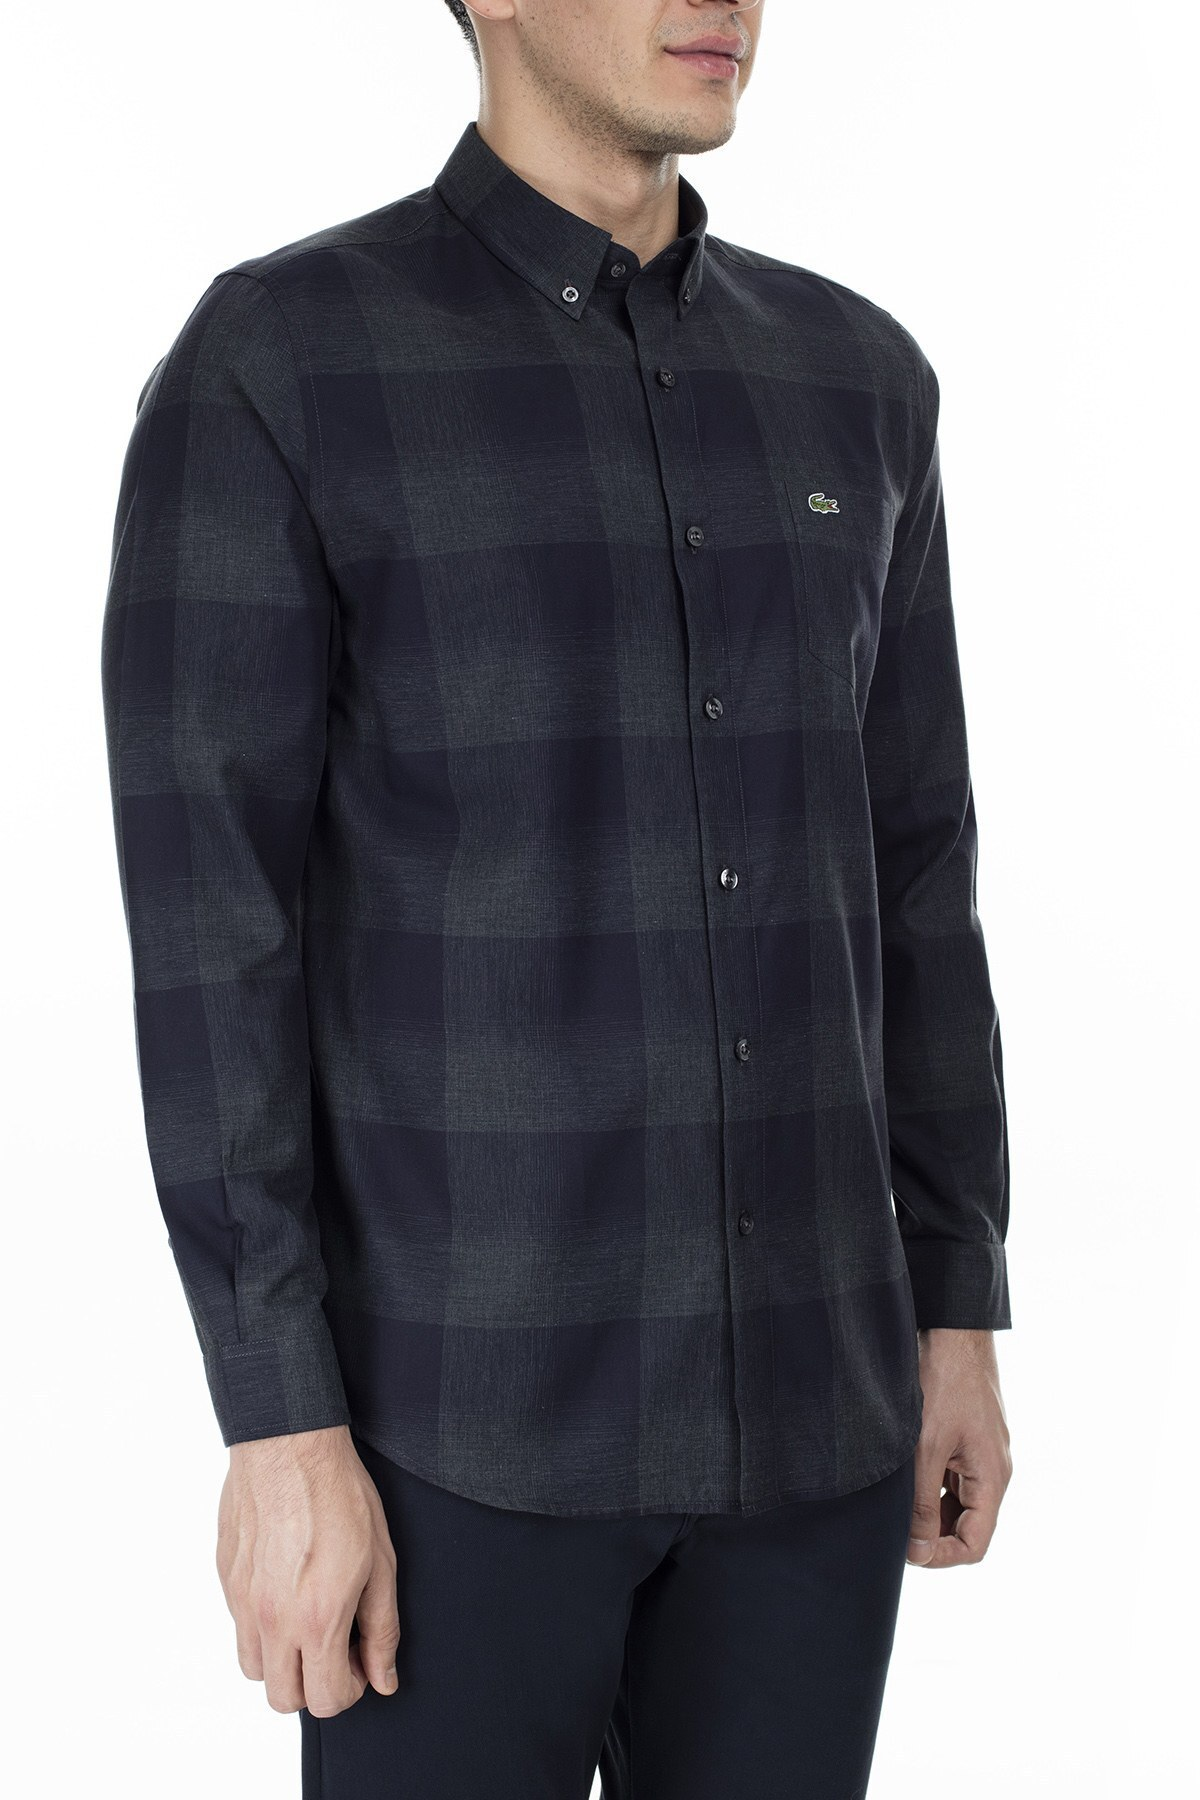 Lacoste Regular Fit Ekose Desenli Erkek Gömlek CH2016 16L FÜME